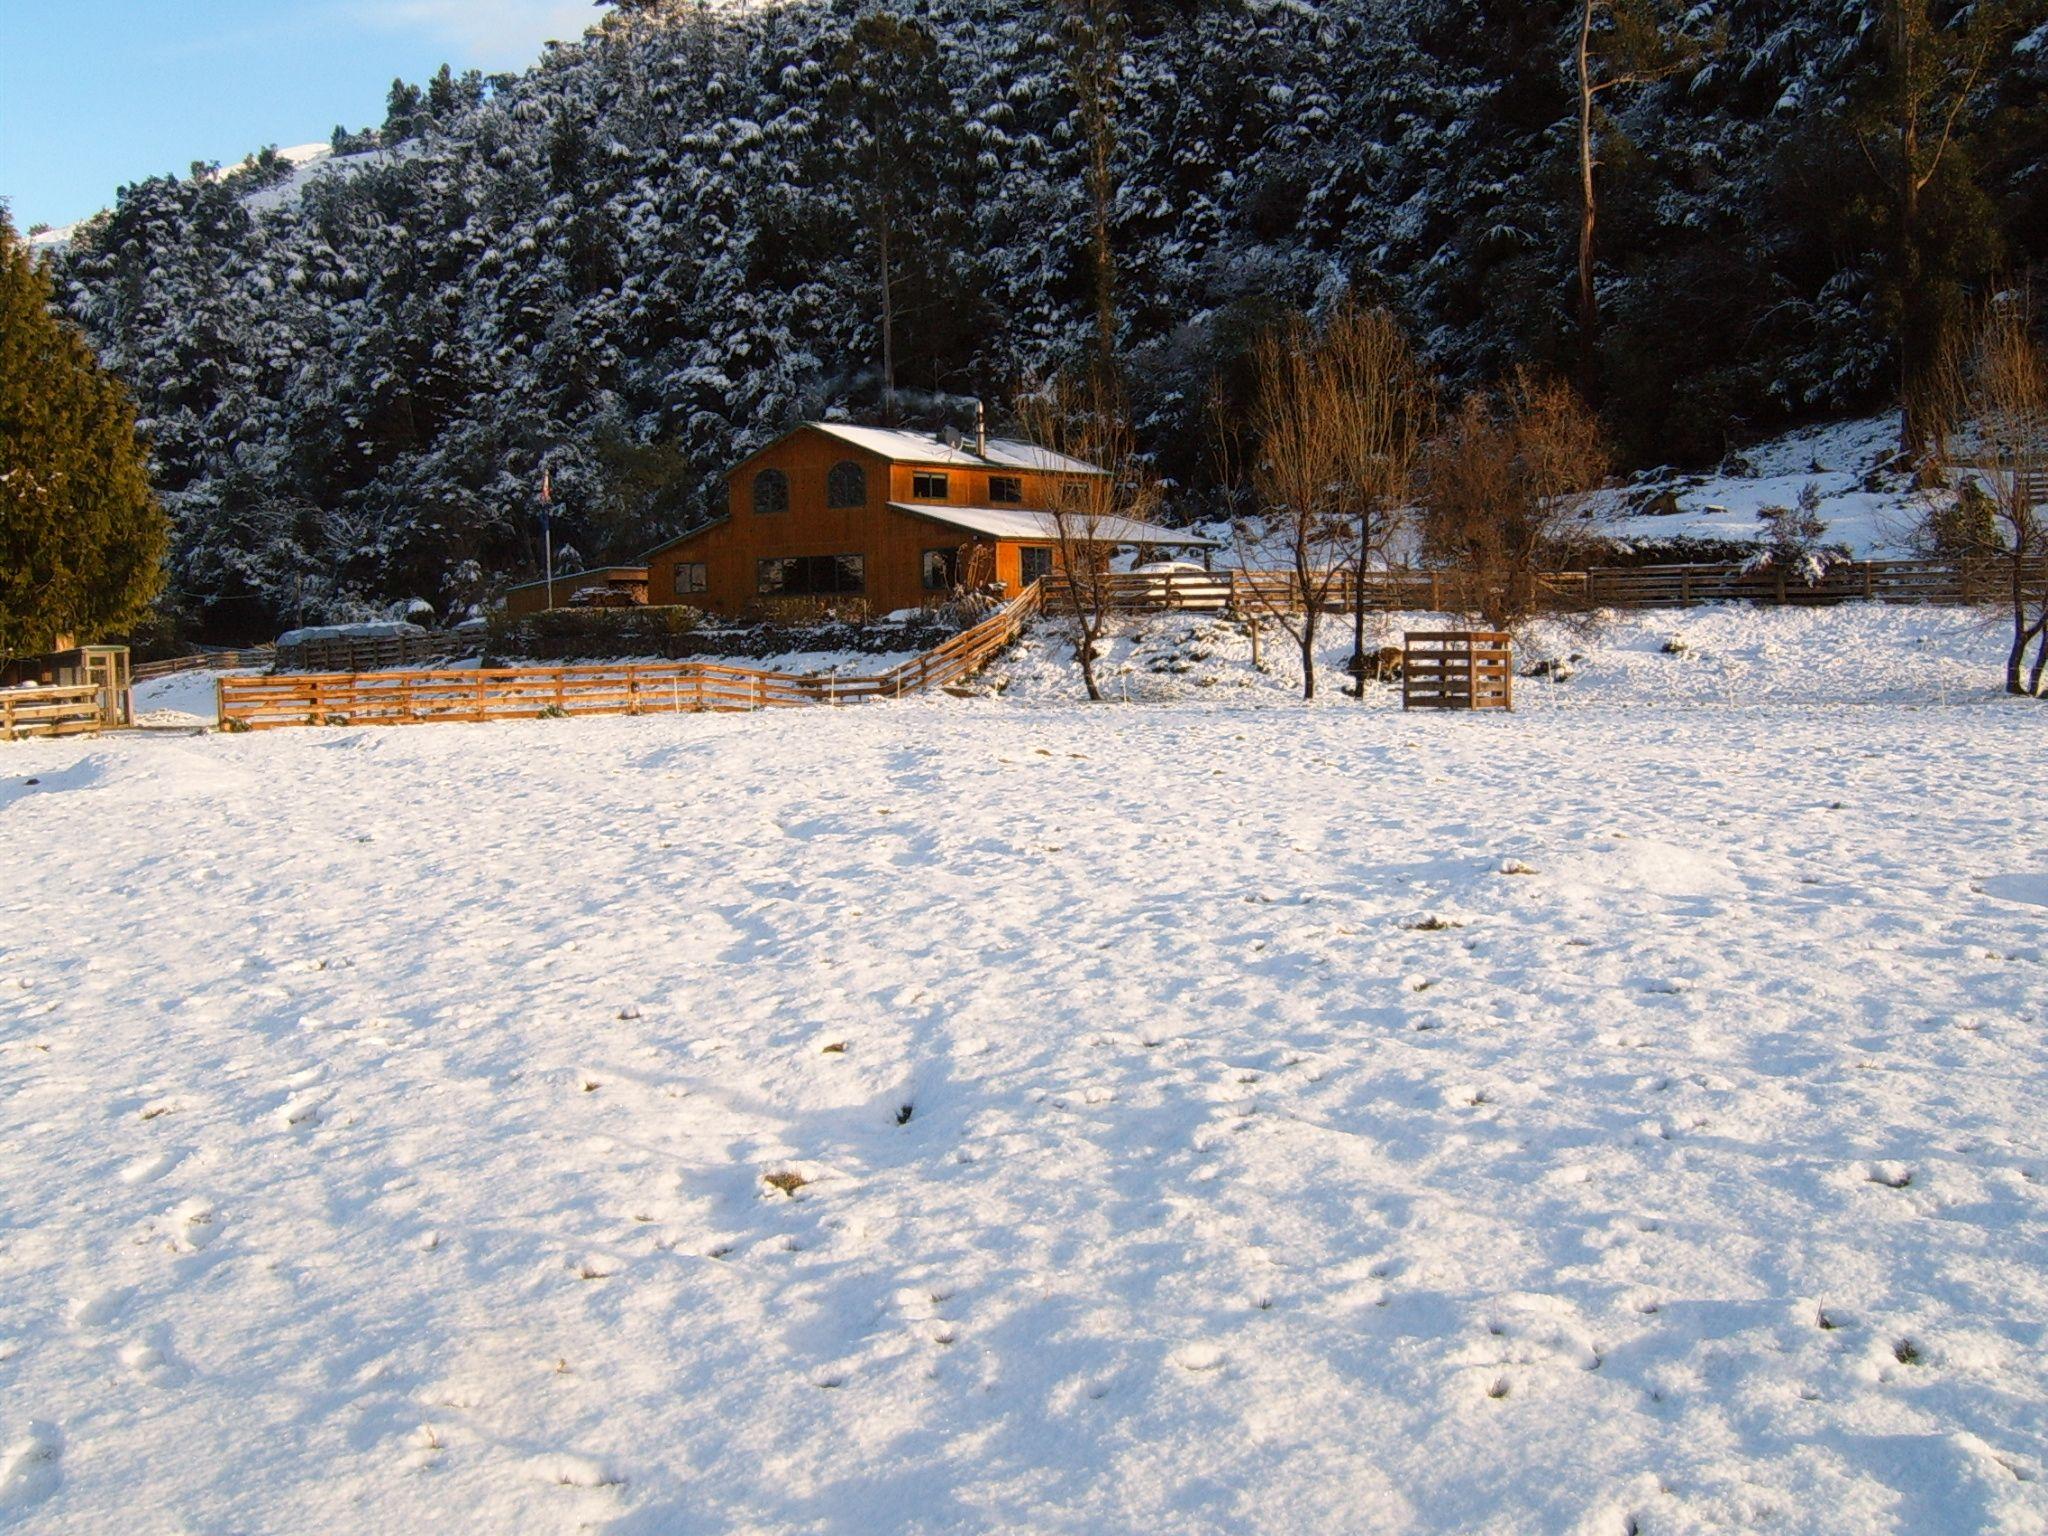 Customkit in the Snow